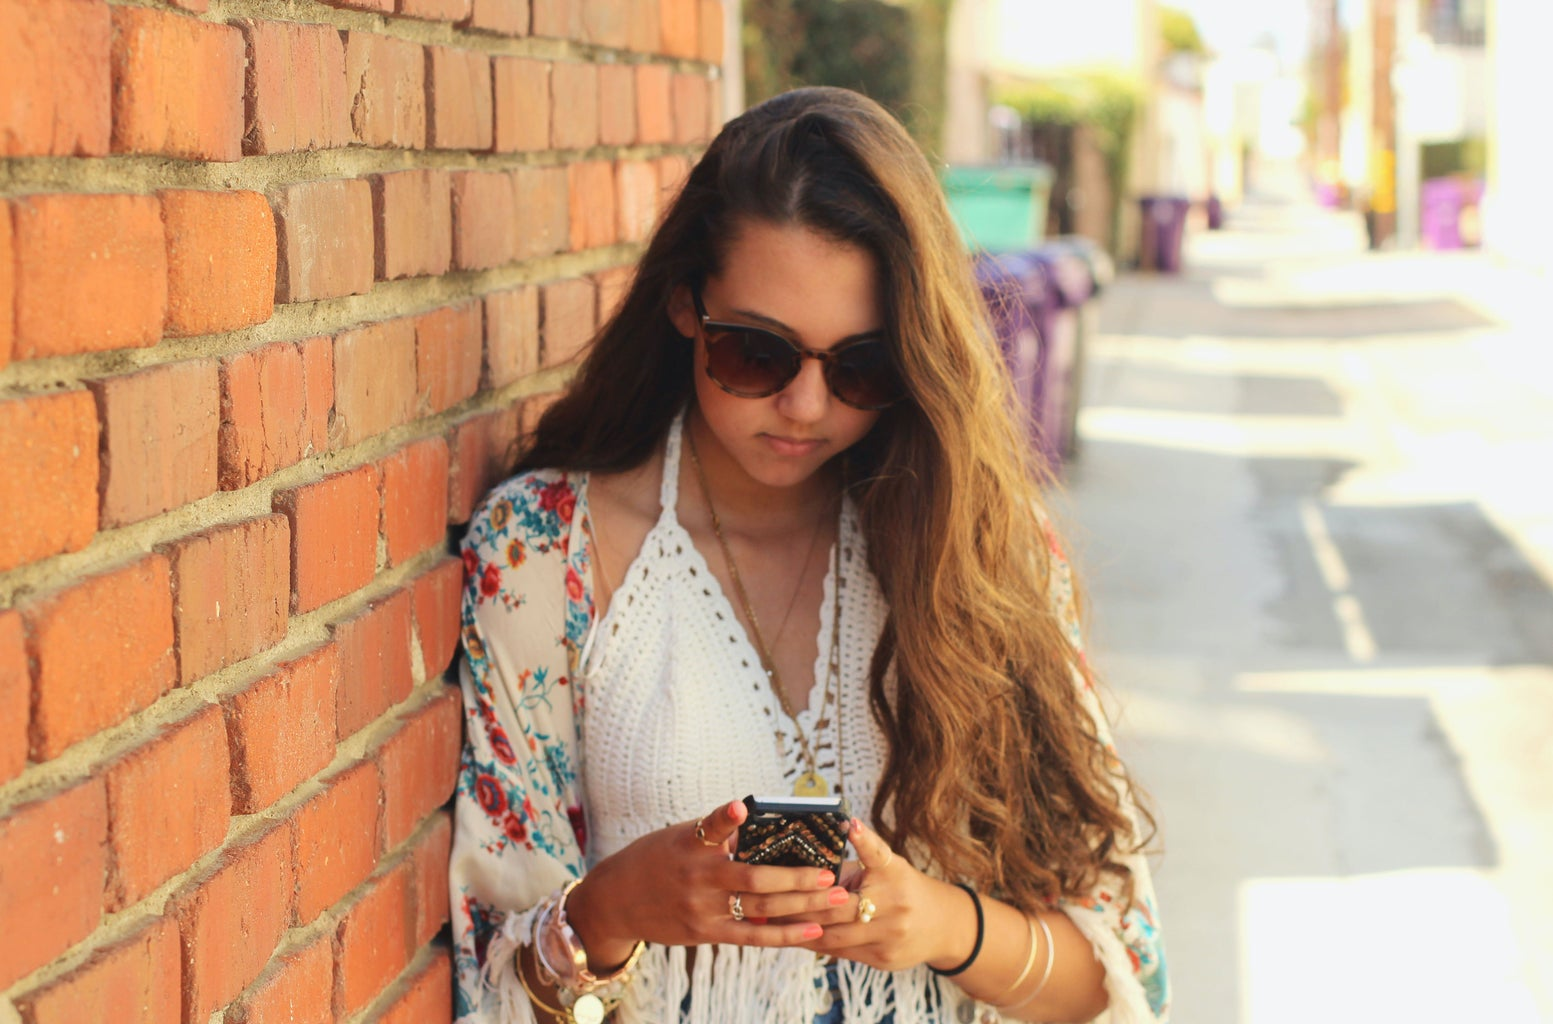 Kellyn Simpkin-Girl Next To Brick Wall Texting